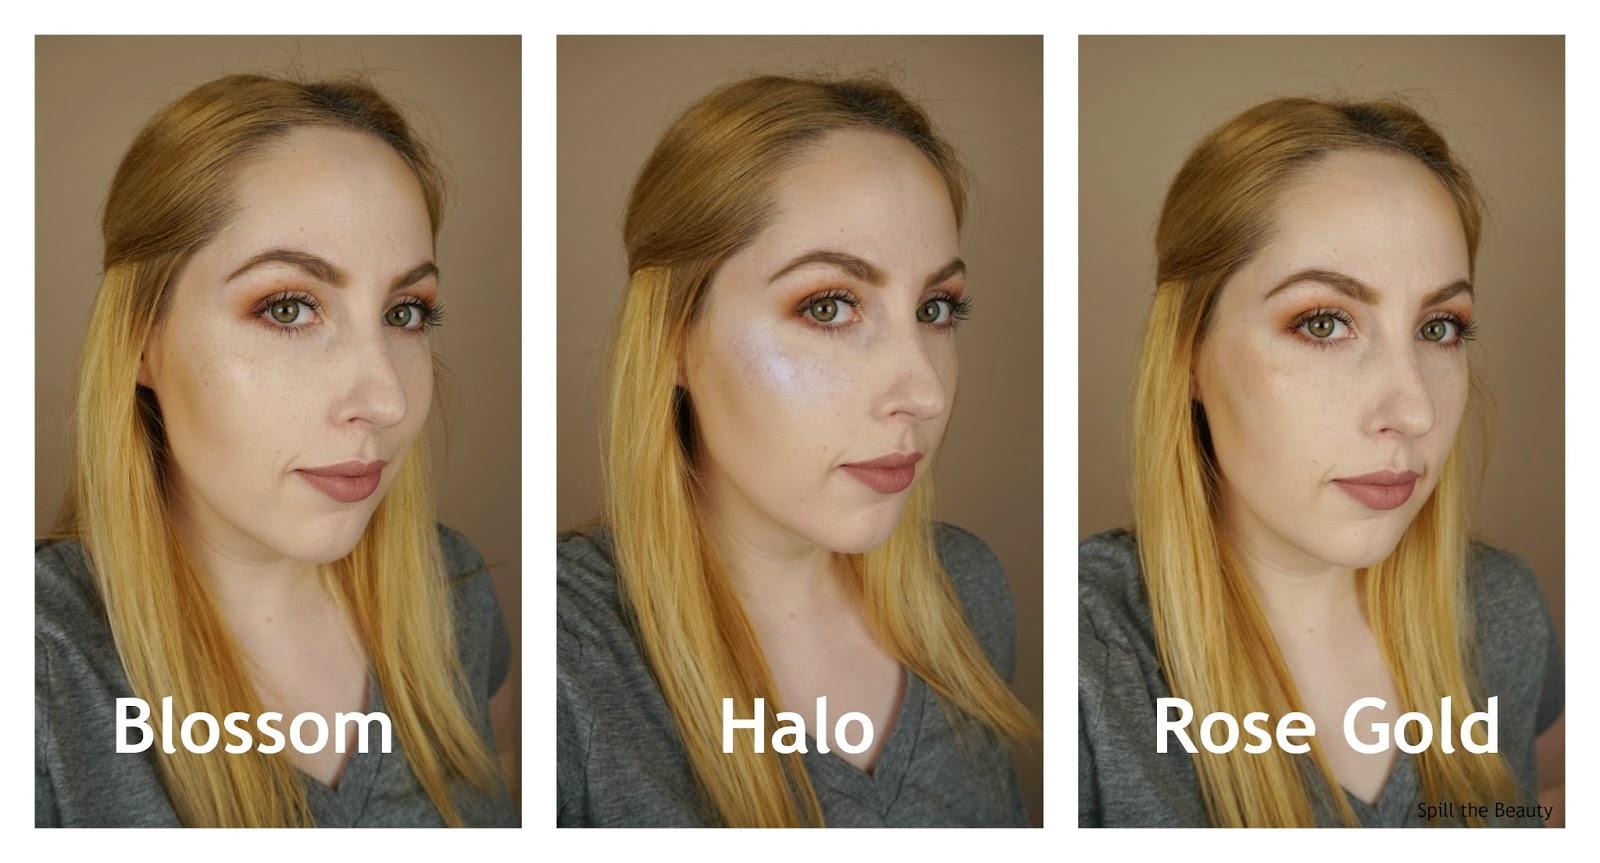 Cover FX Custom Enhancer Drops blossom halo rose gold highlighter review swatches comparison